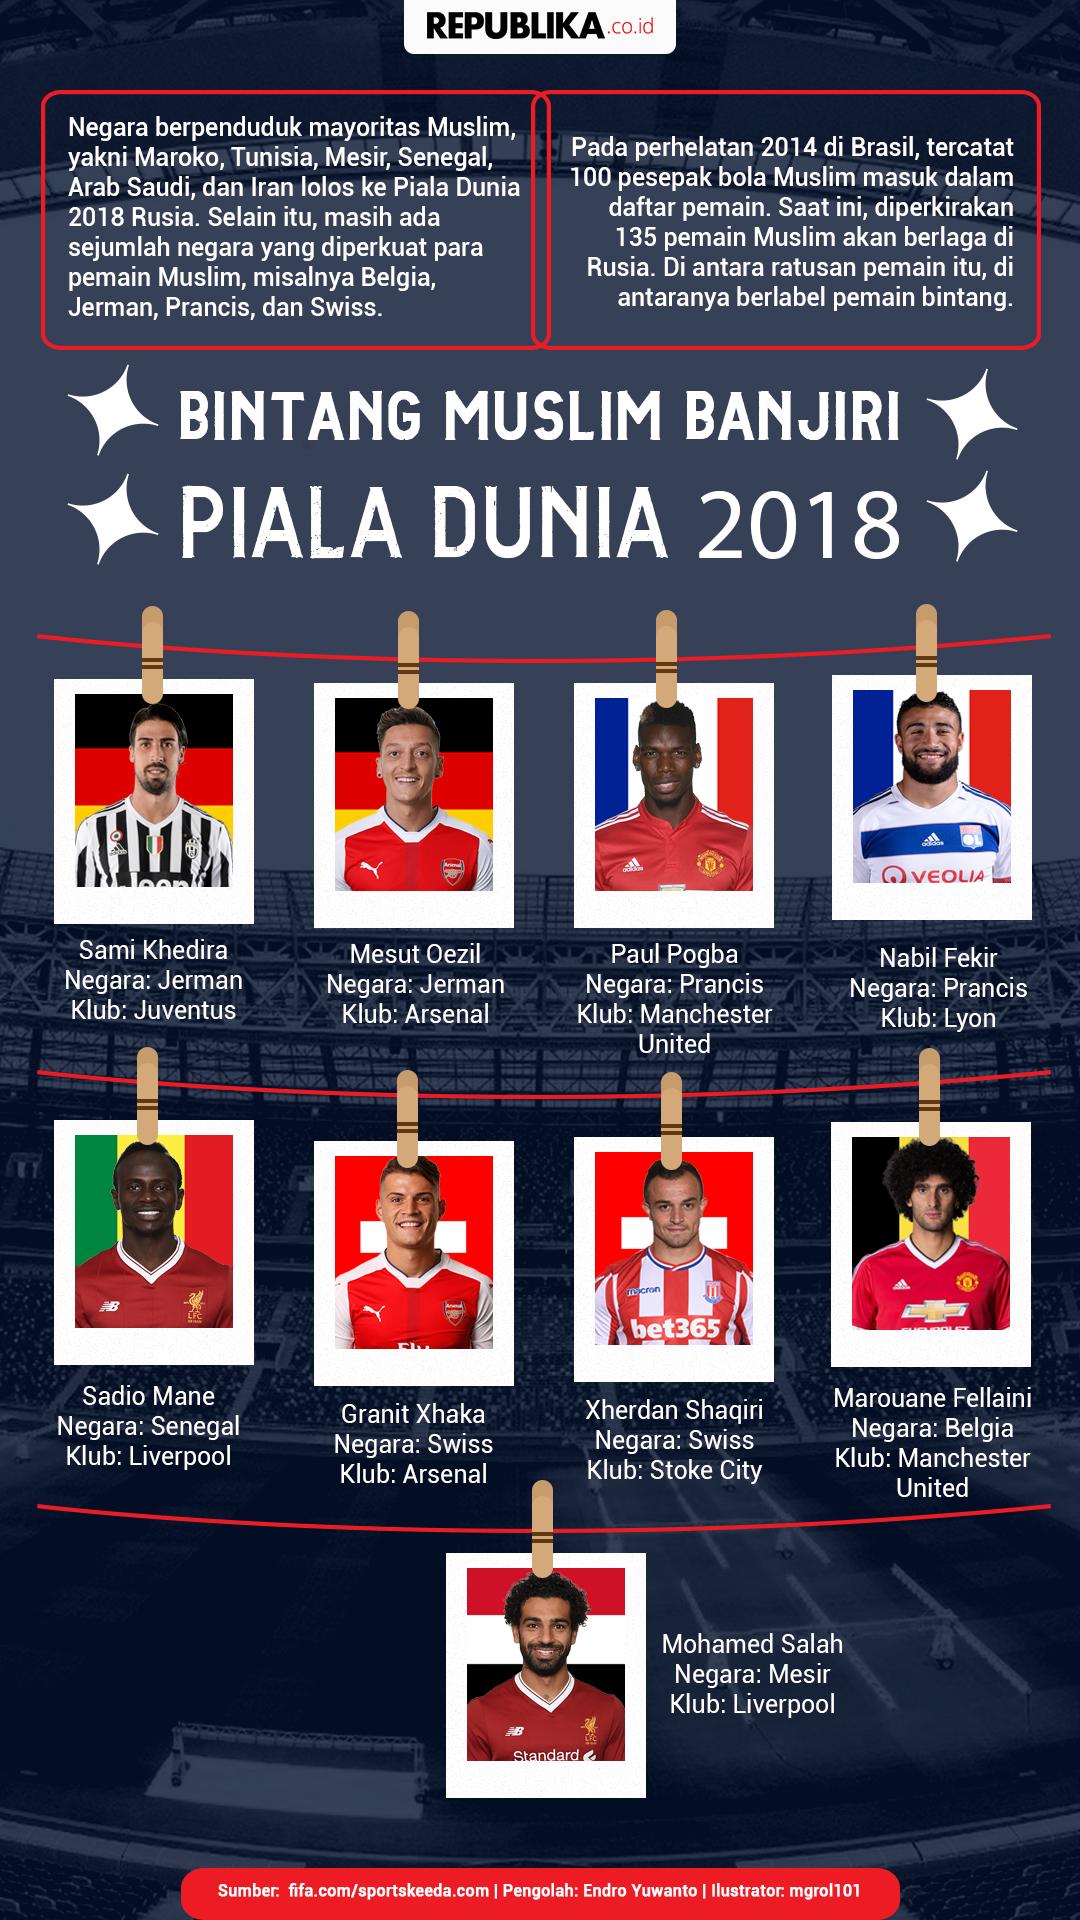 Bintang Muslim Banjiri Piala Dunia 2018